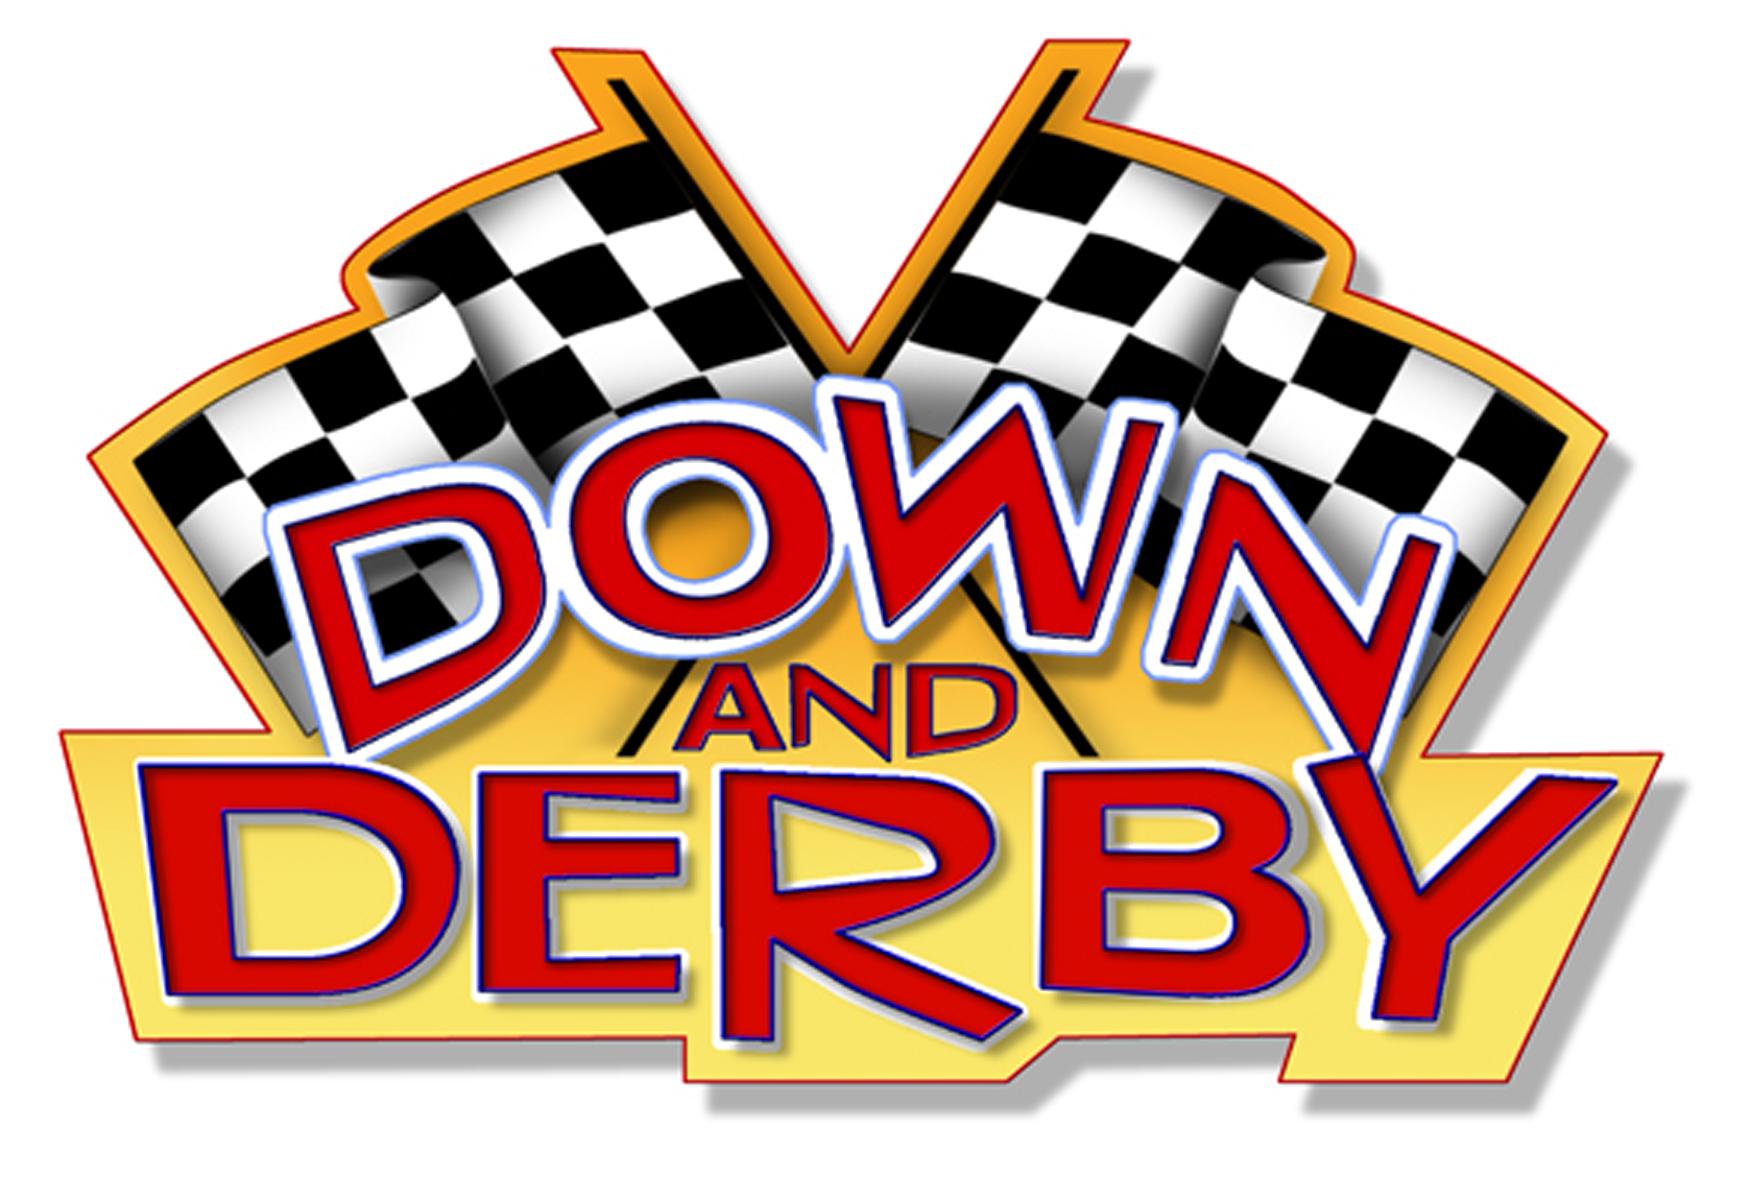 Car Derby Clip Art Pinewood .-Car Derby Clip Art Pinewood .-4